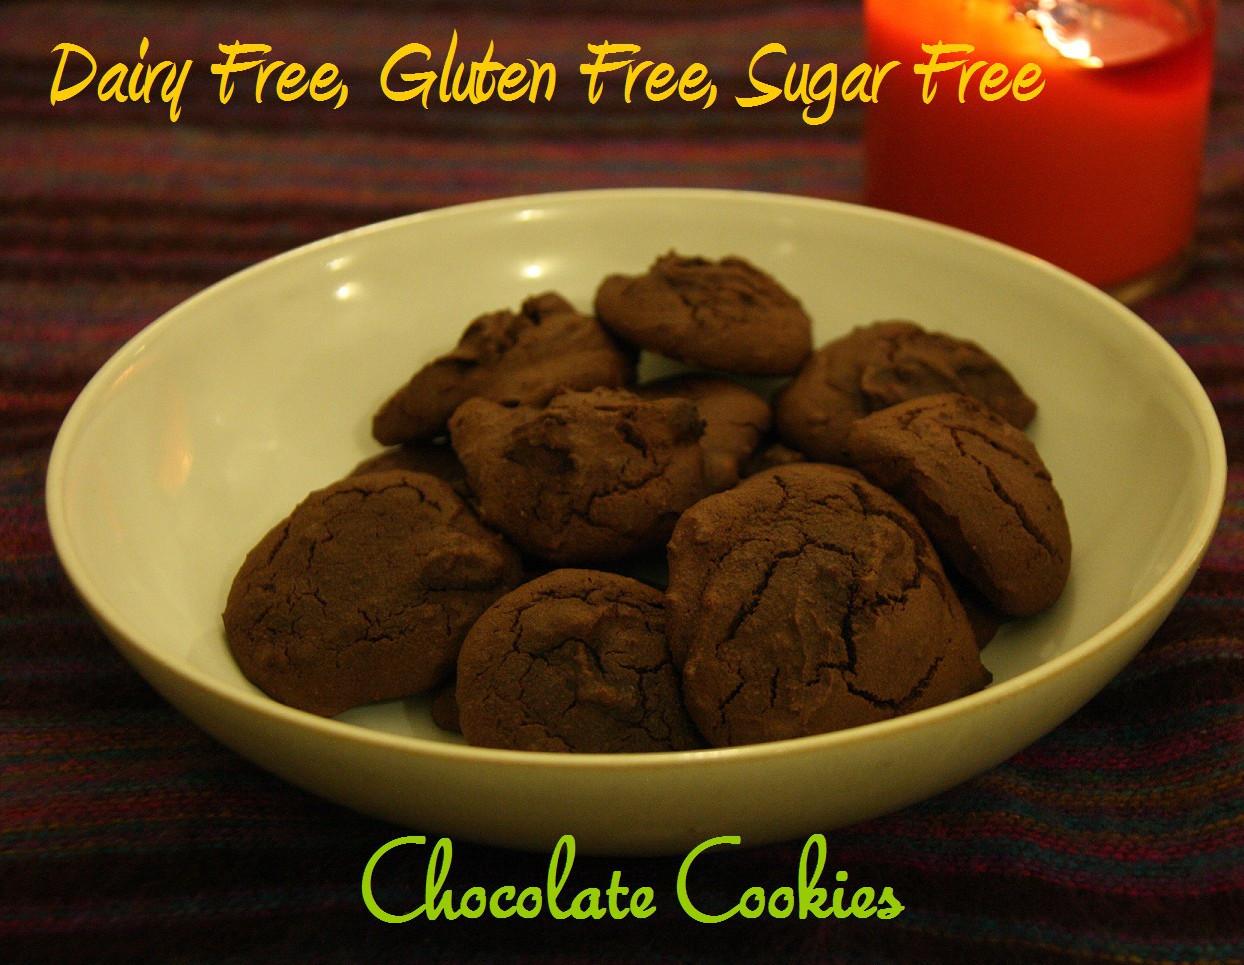 Gluten Free Dairy Free Sugar Cookies  AmorExplore Dairy Free Gluten Free Sugar Free Chocolate